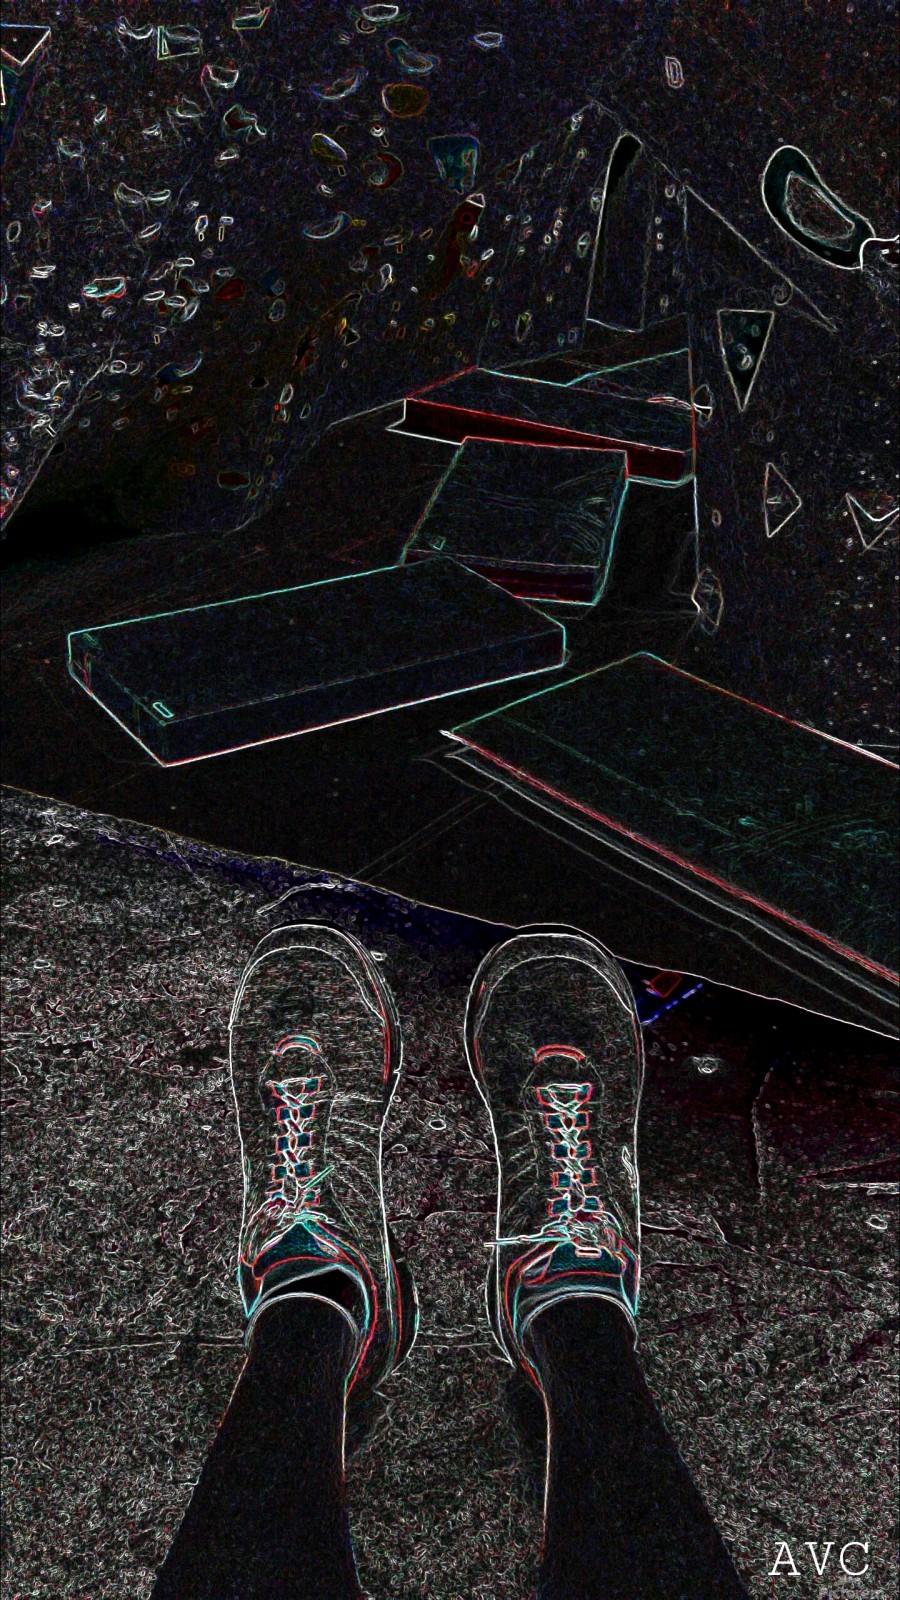 Rock Climbing Feets  Print